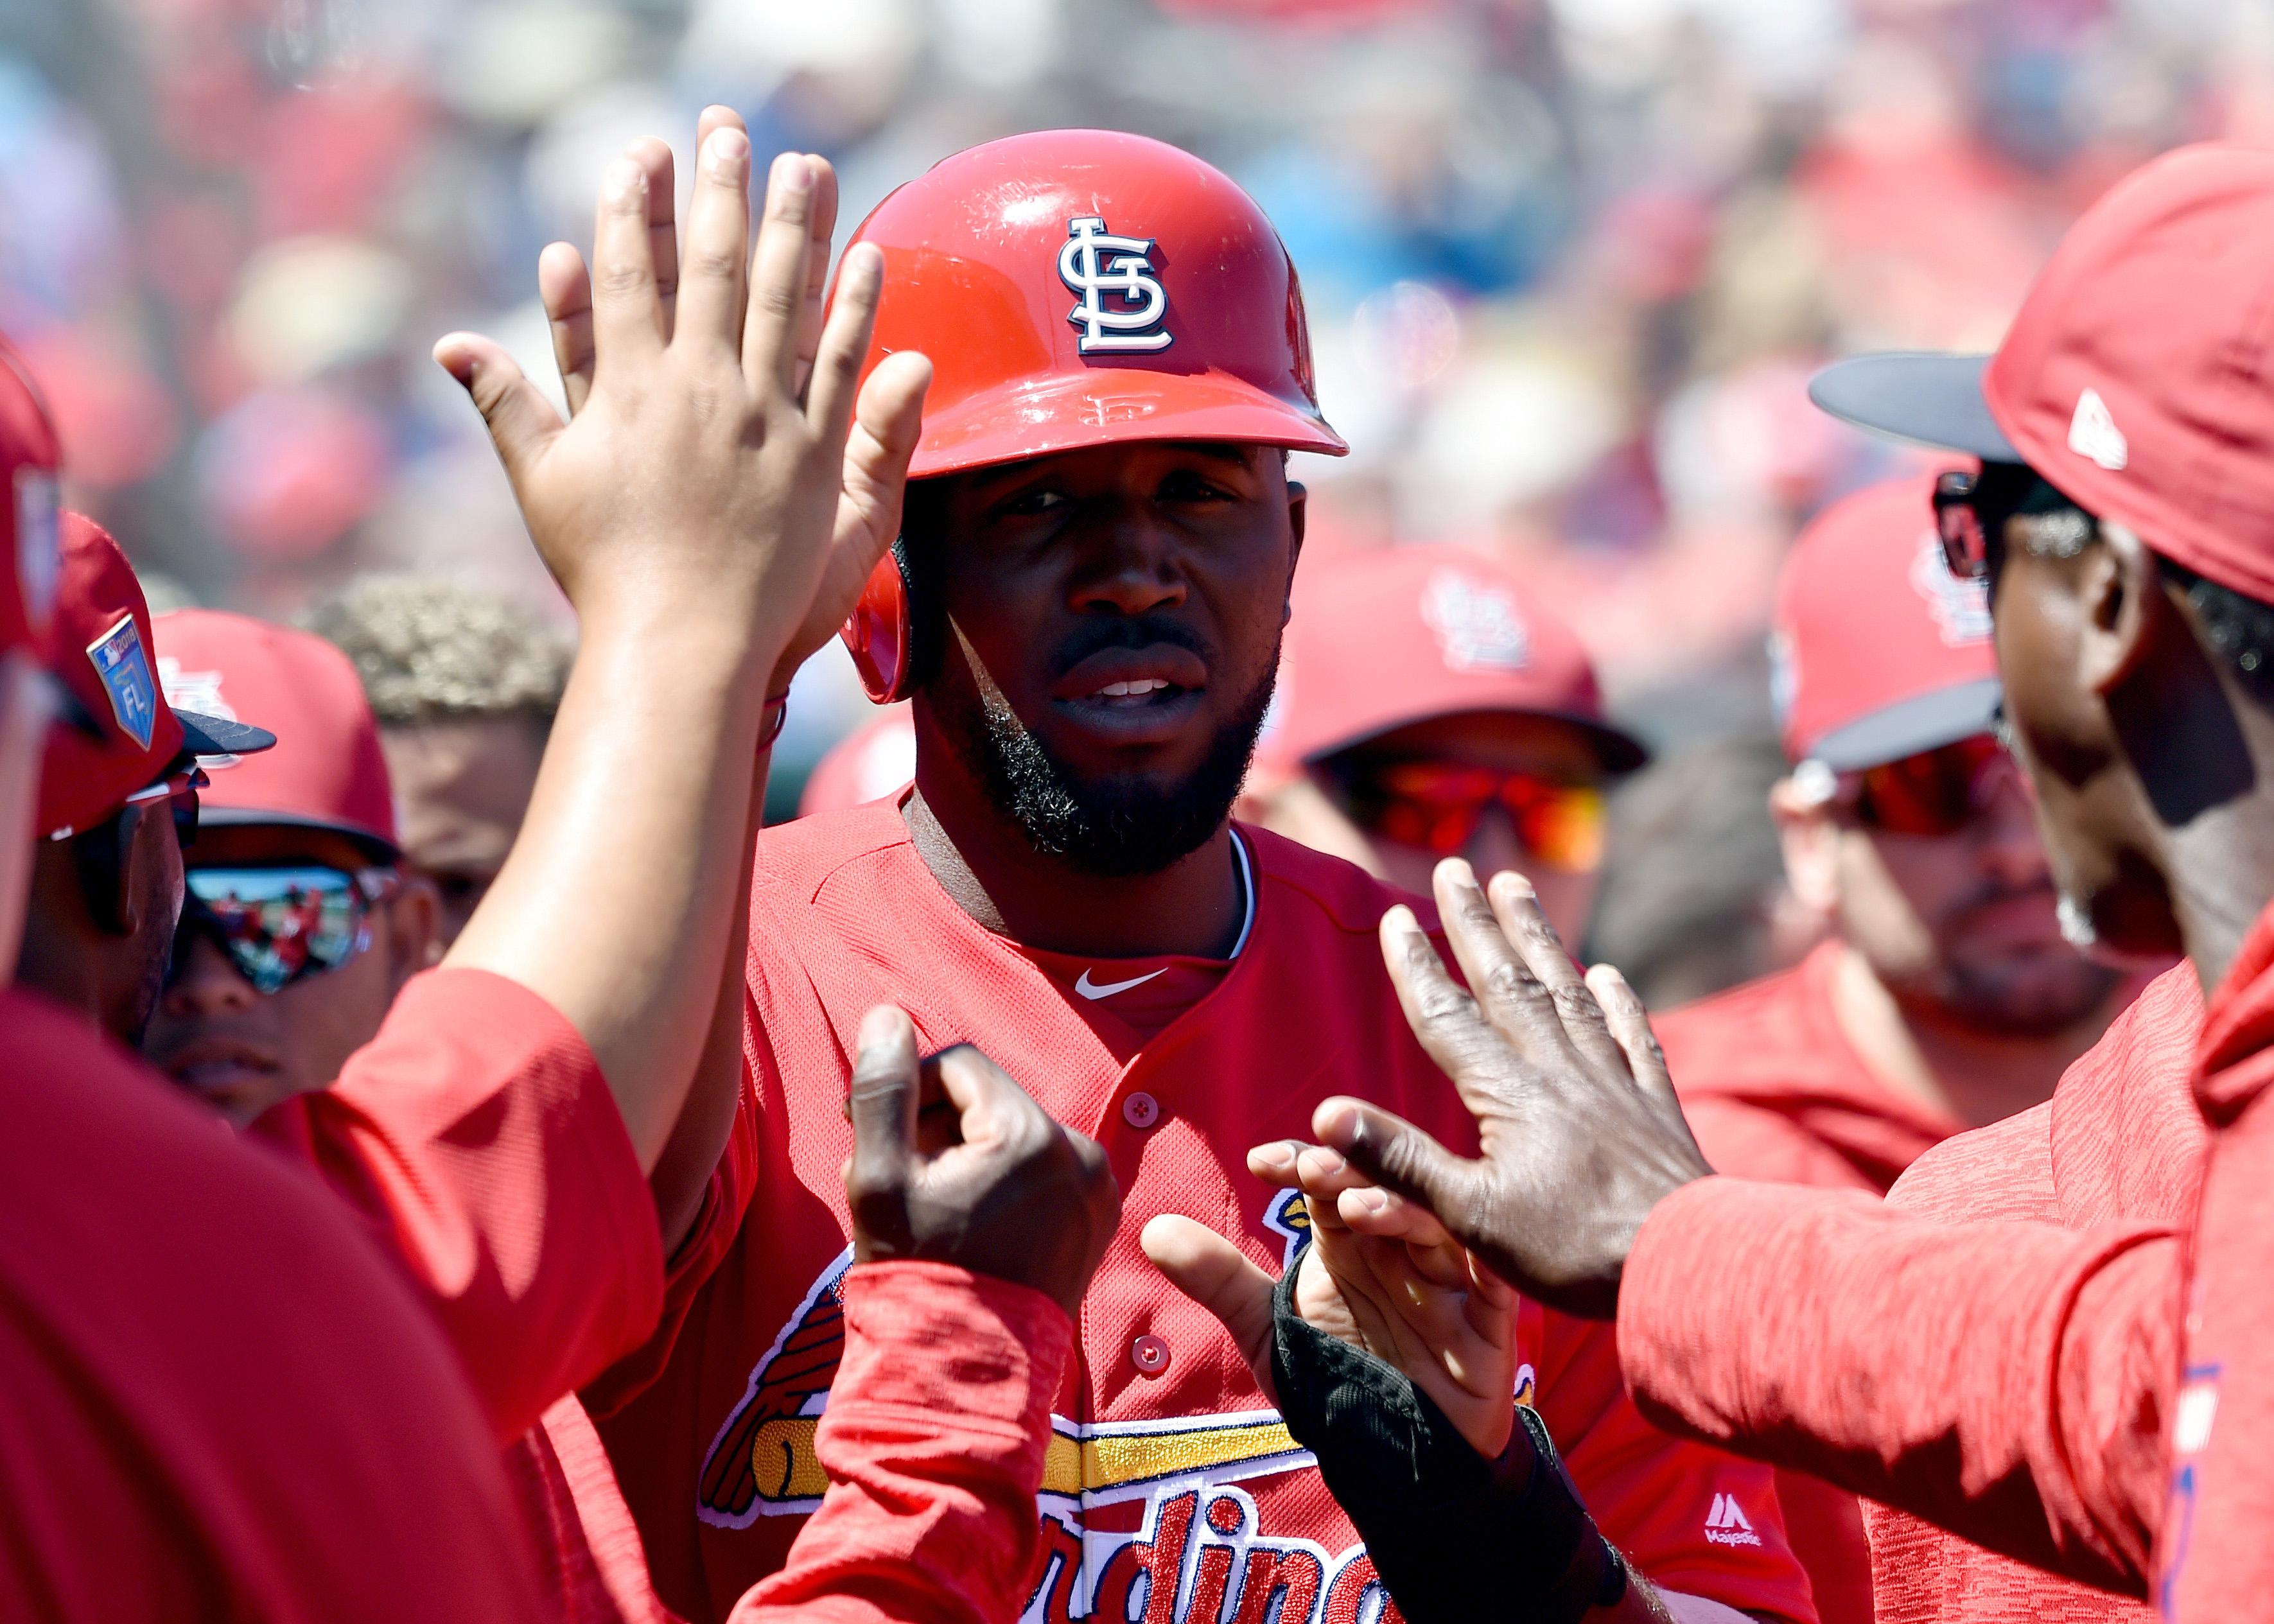 MLB: Spring Training-St. Louis Cardinals at Miami Marlins